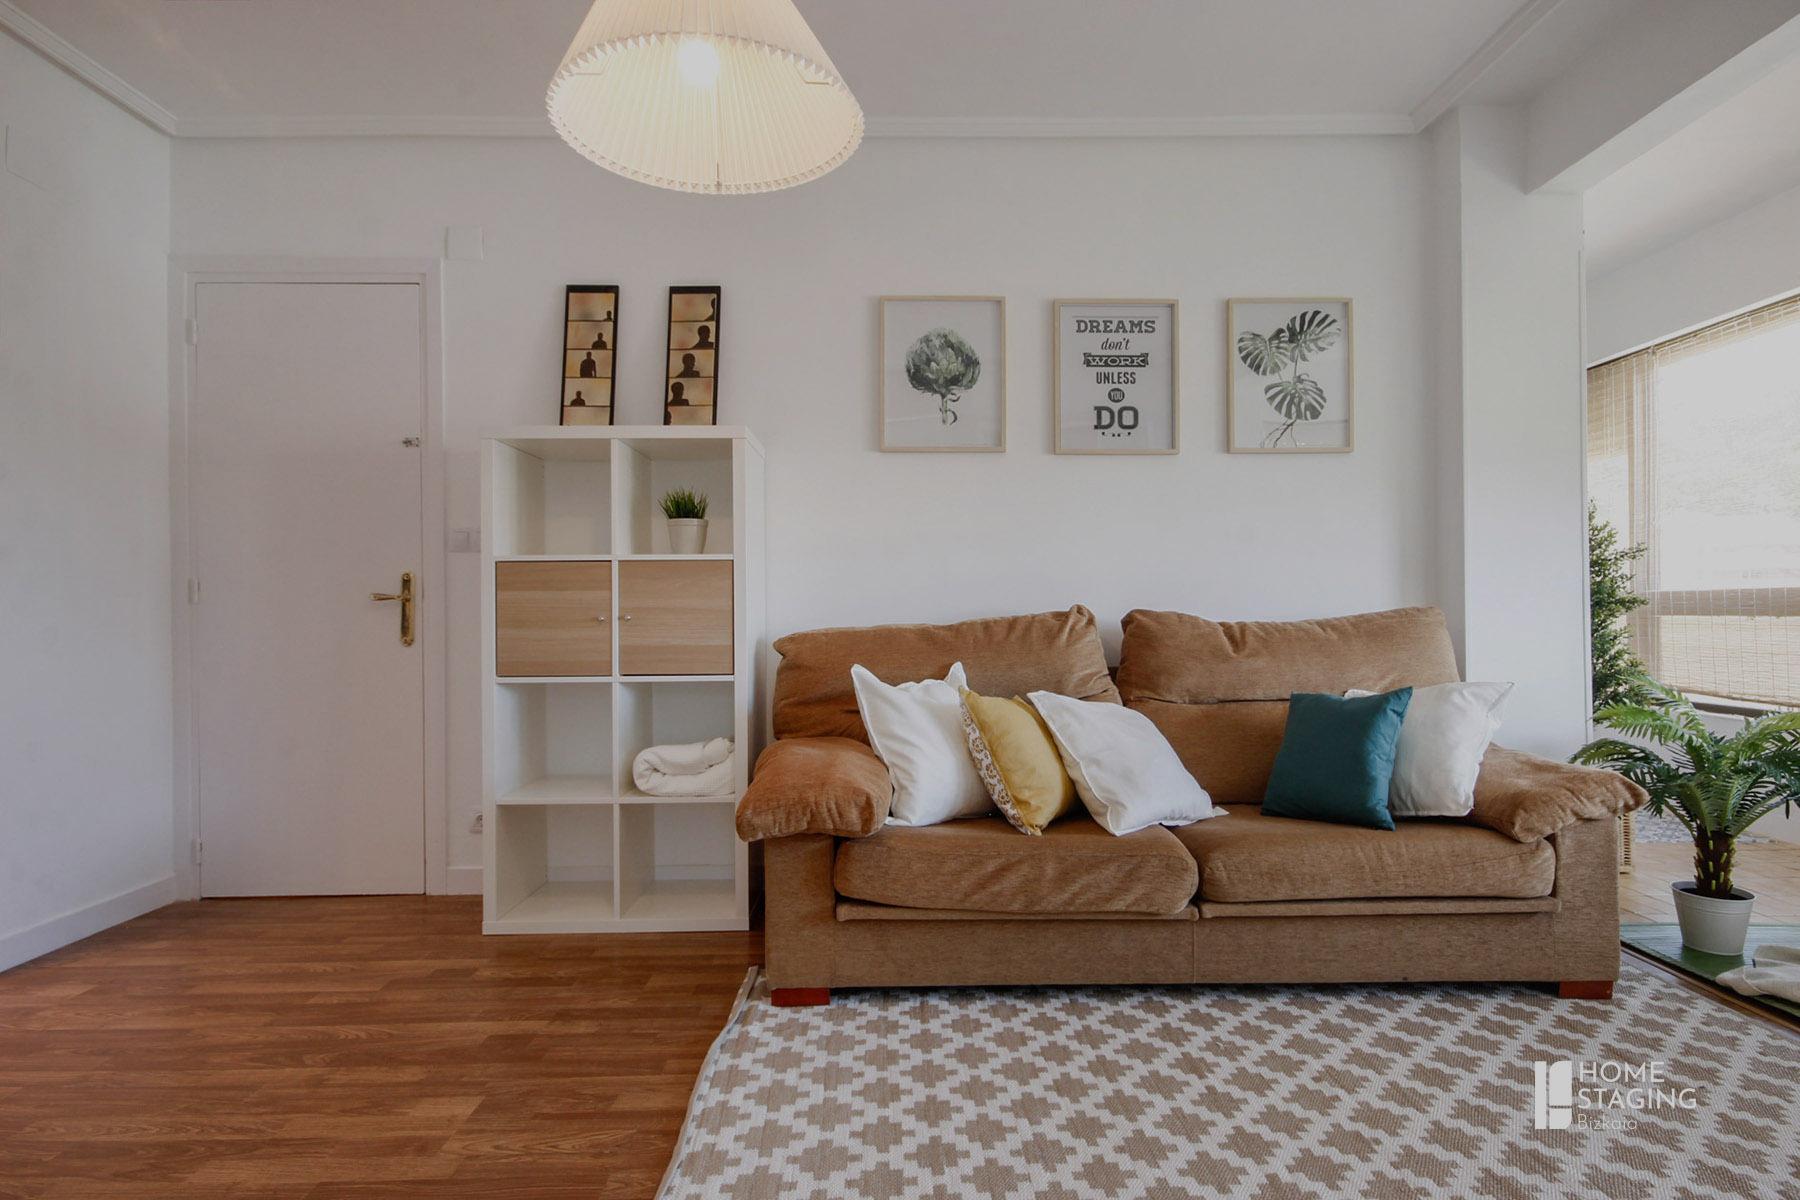 alfombra-salón-alquiler-vacaciona-home-staging